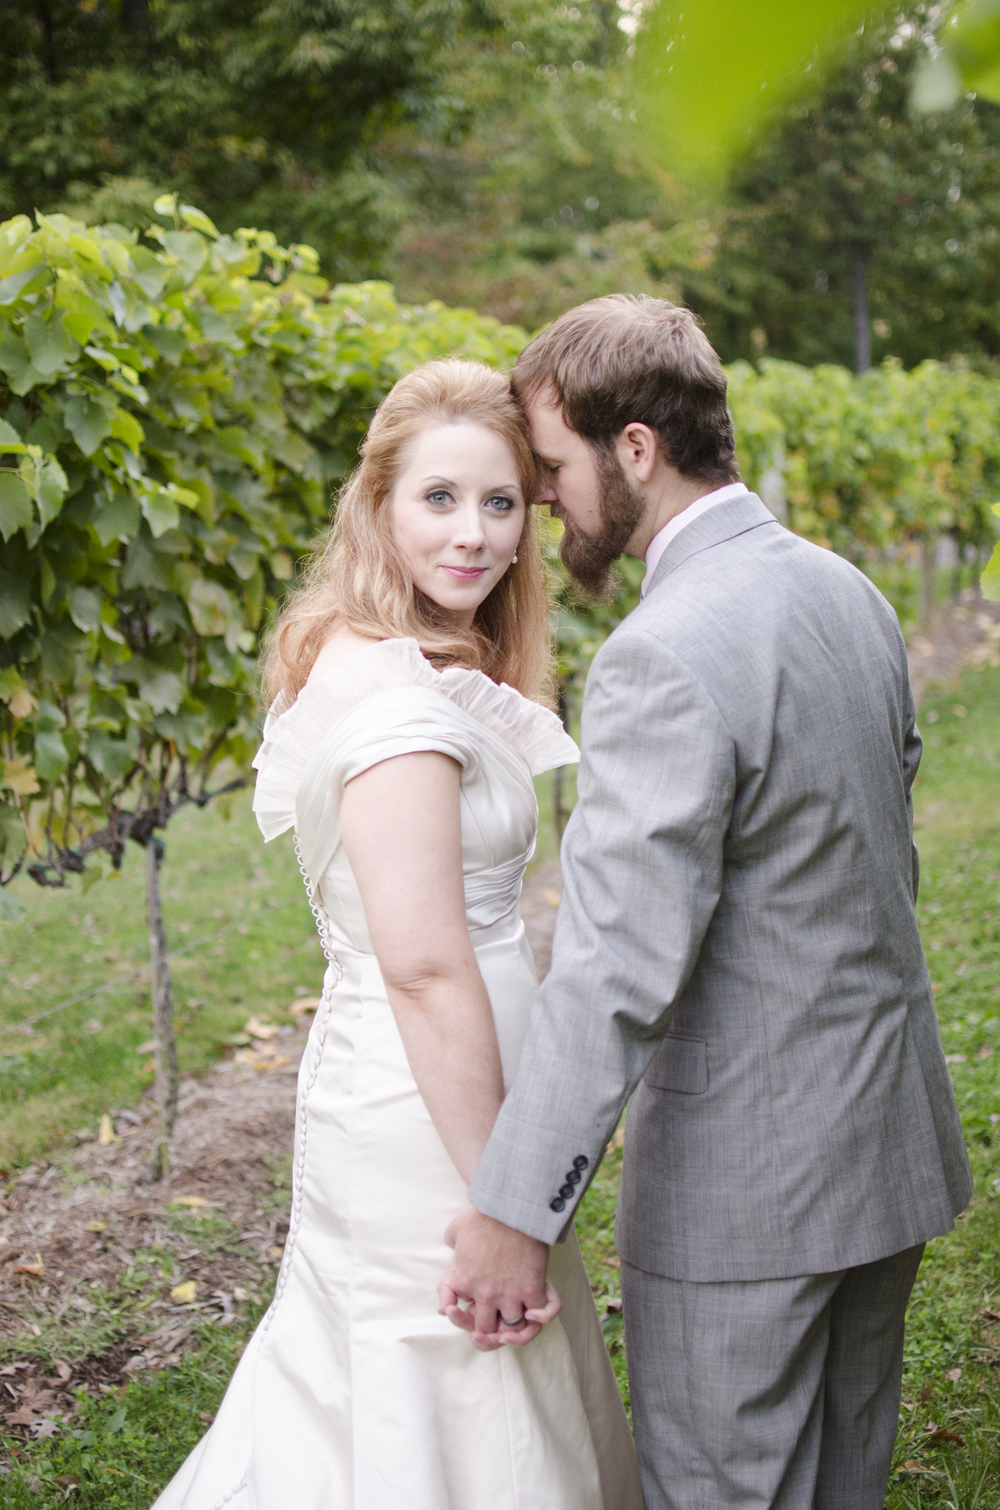 Veritas Vineyard Charlotteville, Virginia wedding photographer